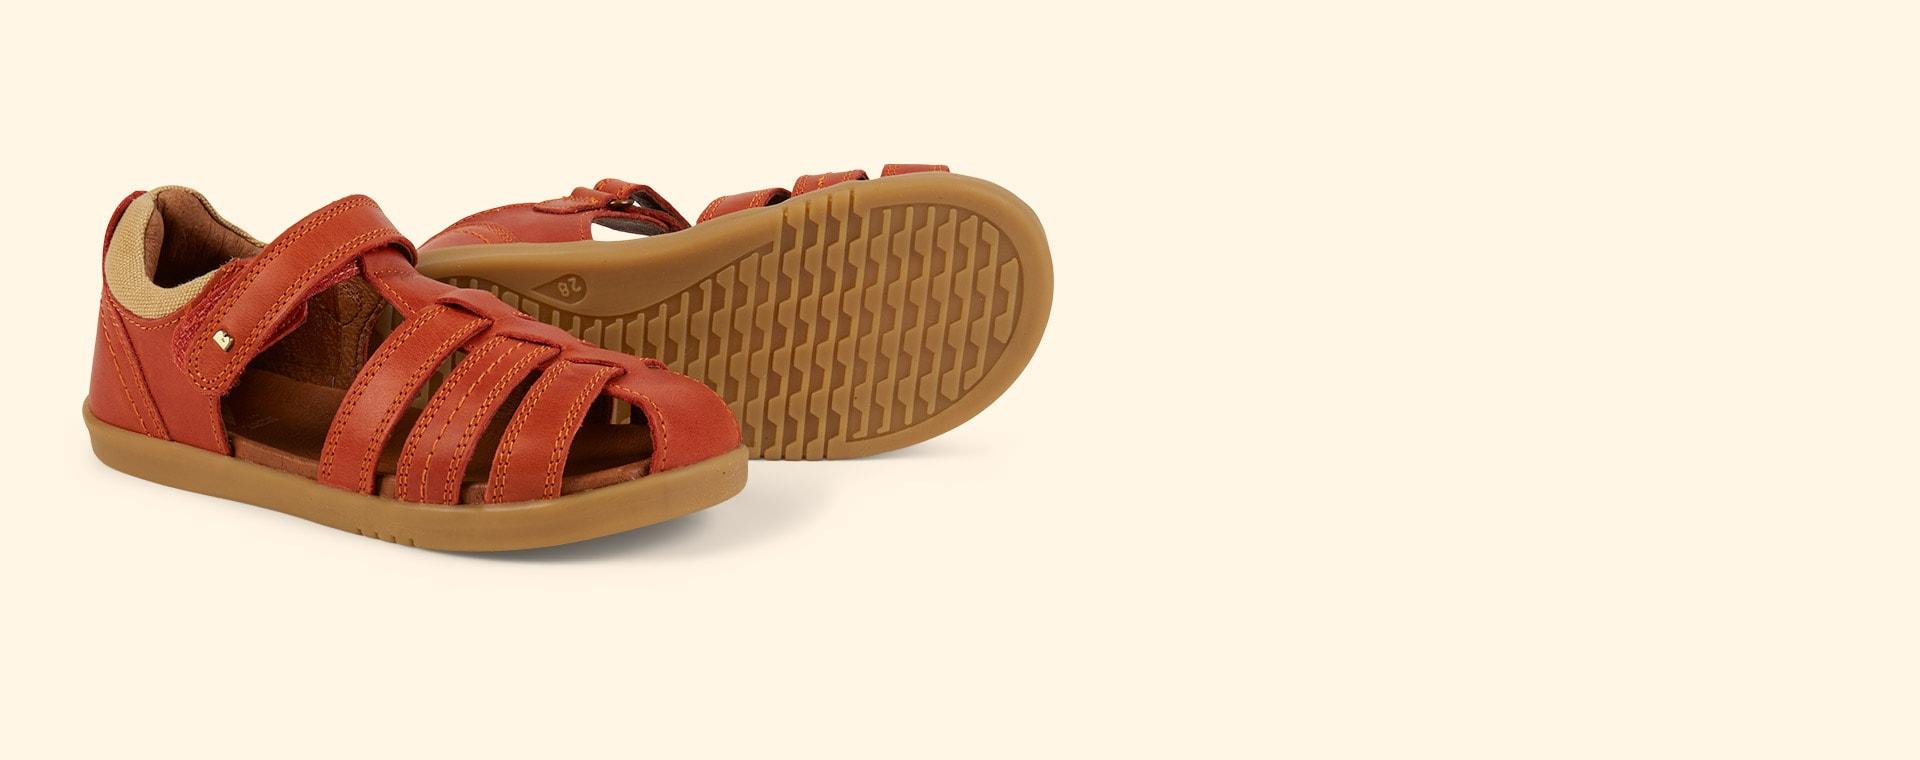 Paprika Bobux Kid+ Roam Sandal